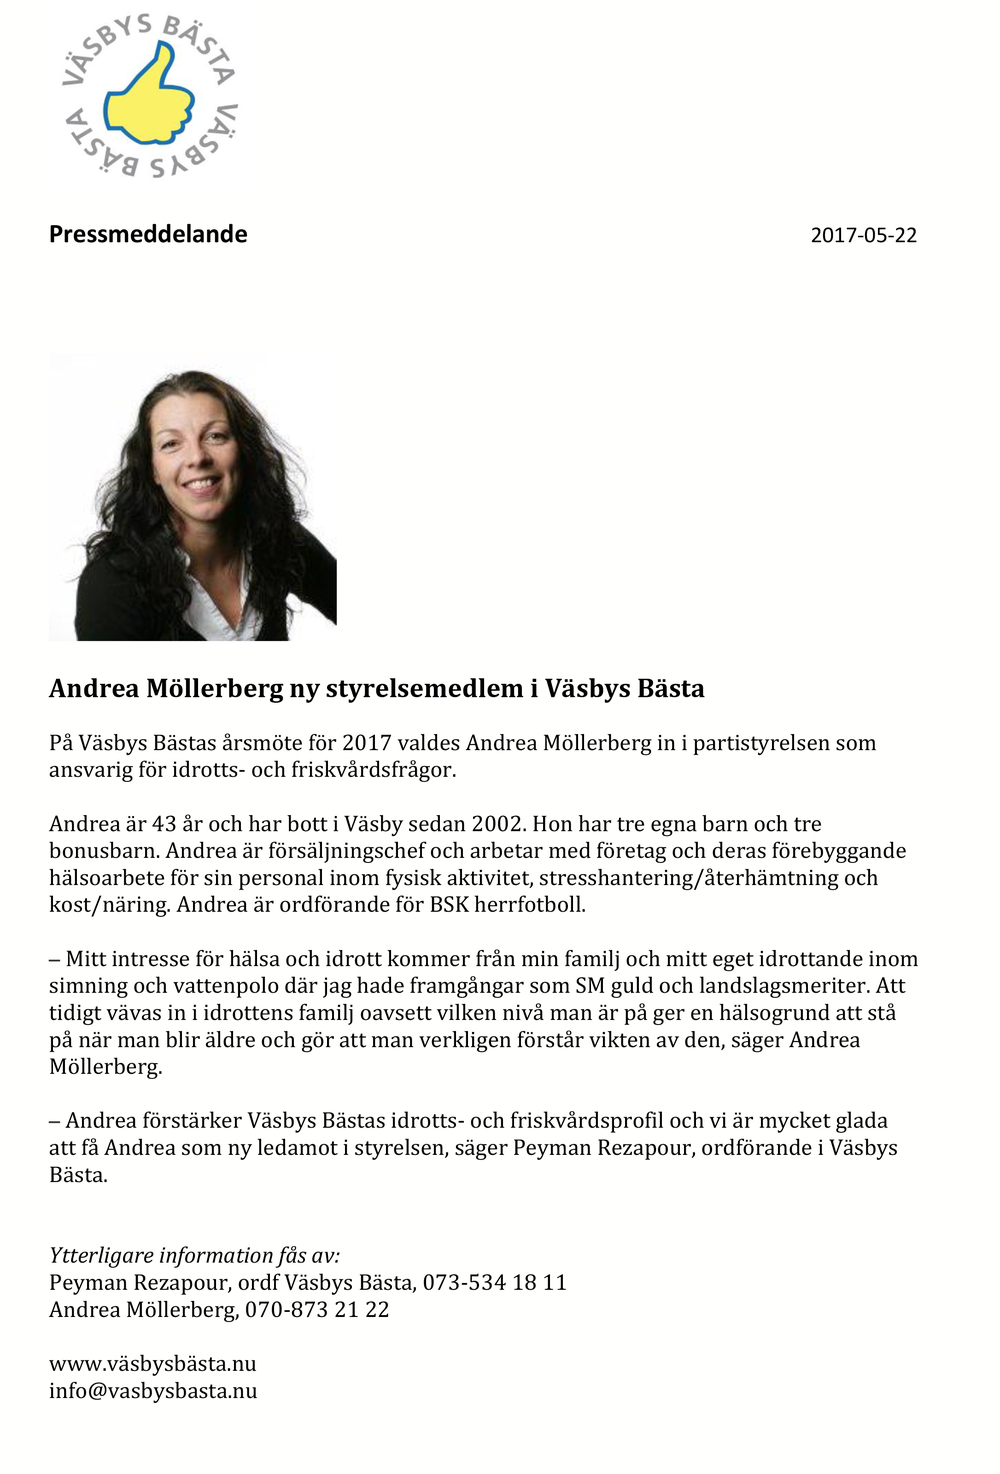 2017-05-22 Pressmeddelande Andrea Möllerberg (1) kopiera.png